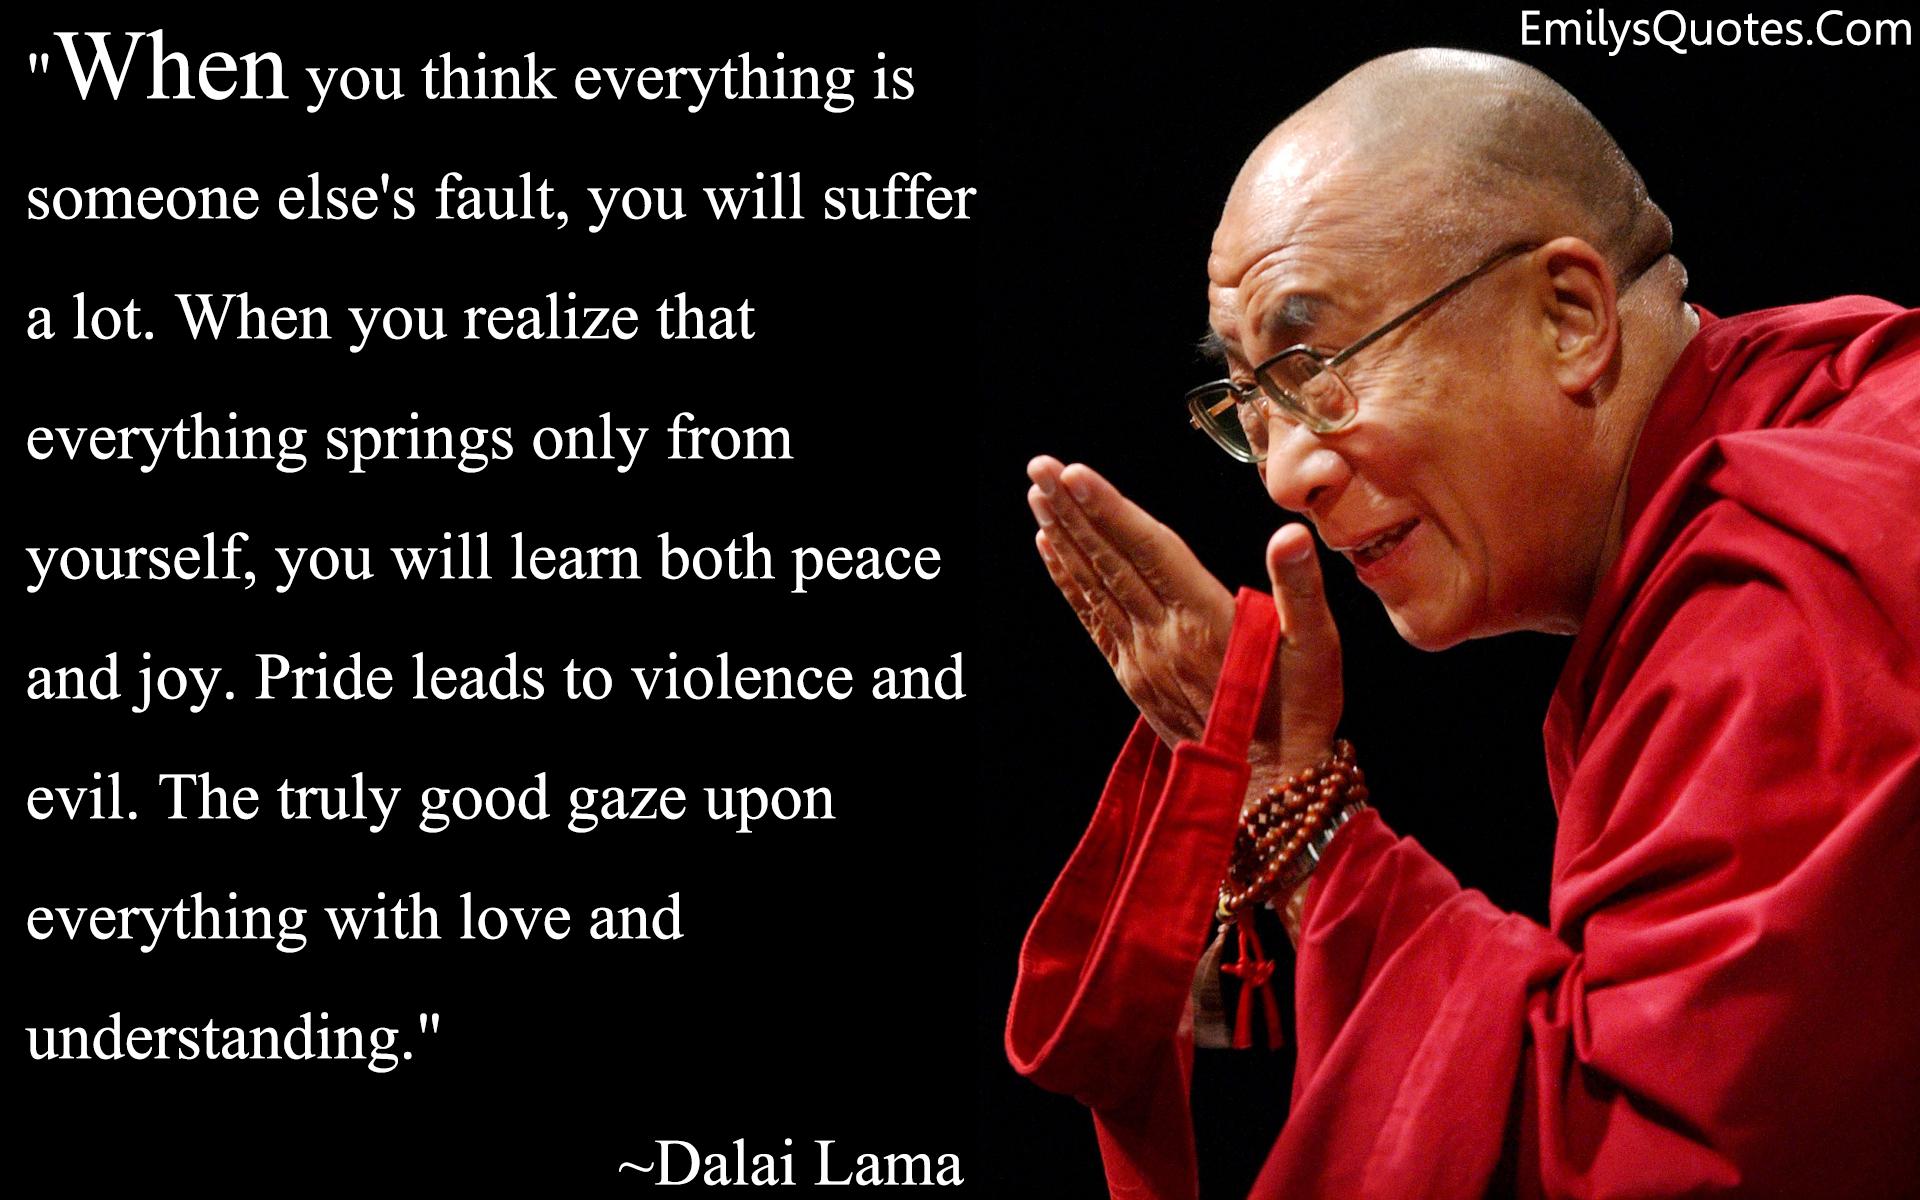 EmilysQuotes.Com - amazing, great, wisdom, peace, Dalai Lama, suffer, evil, inspirational, experience